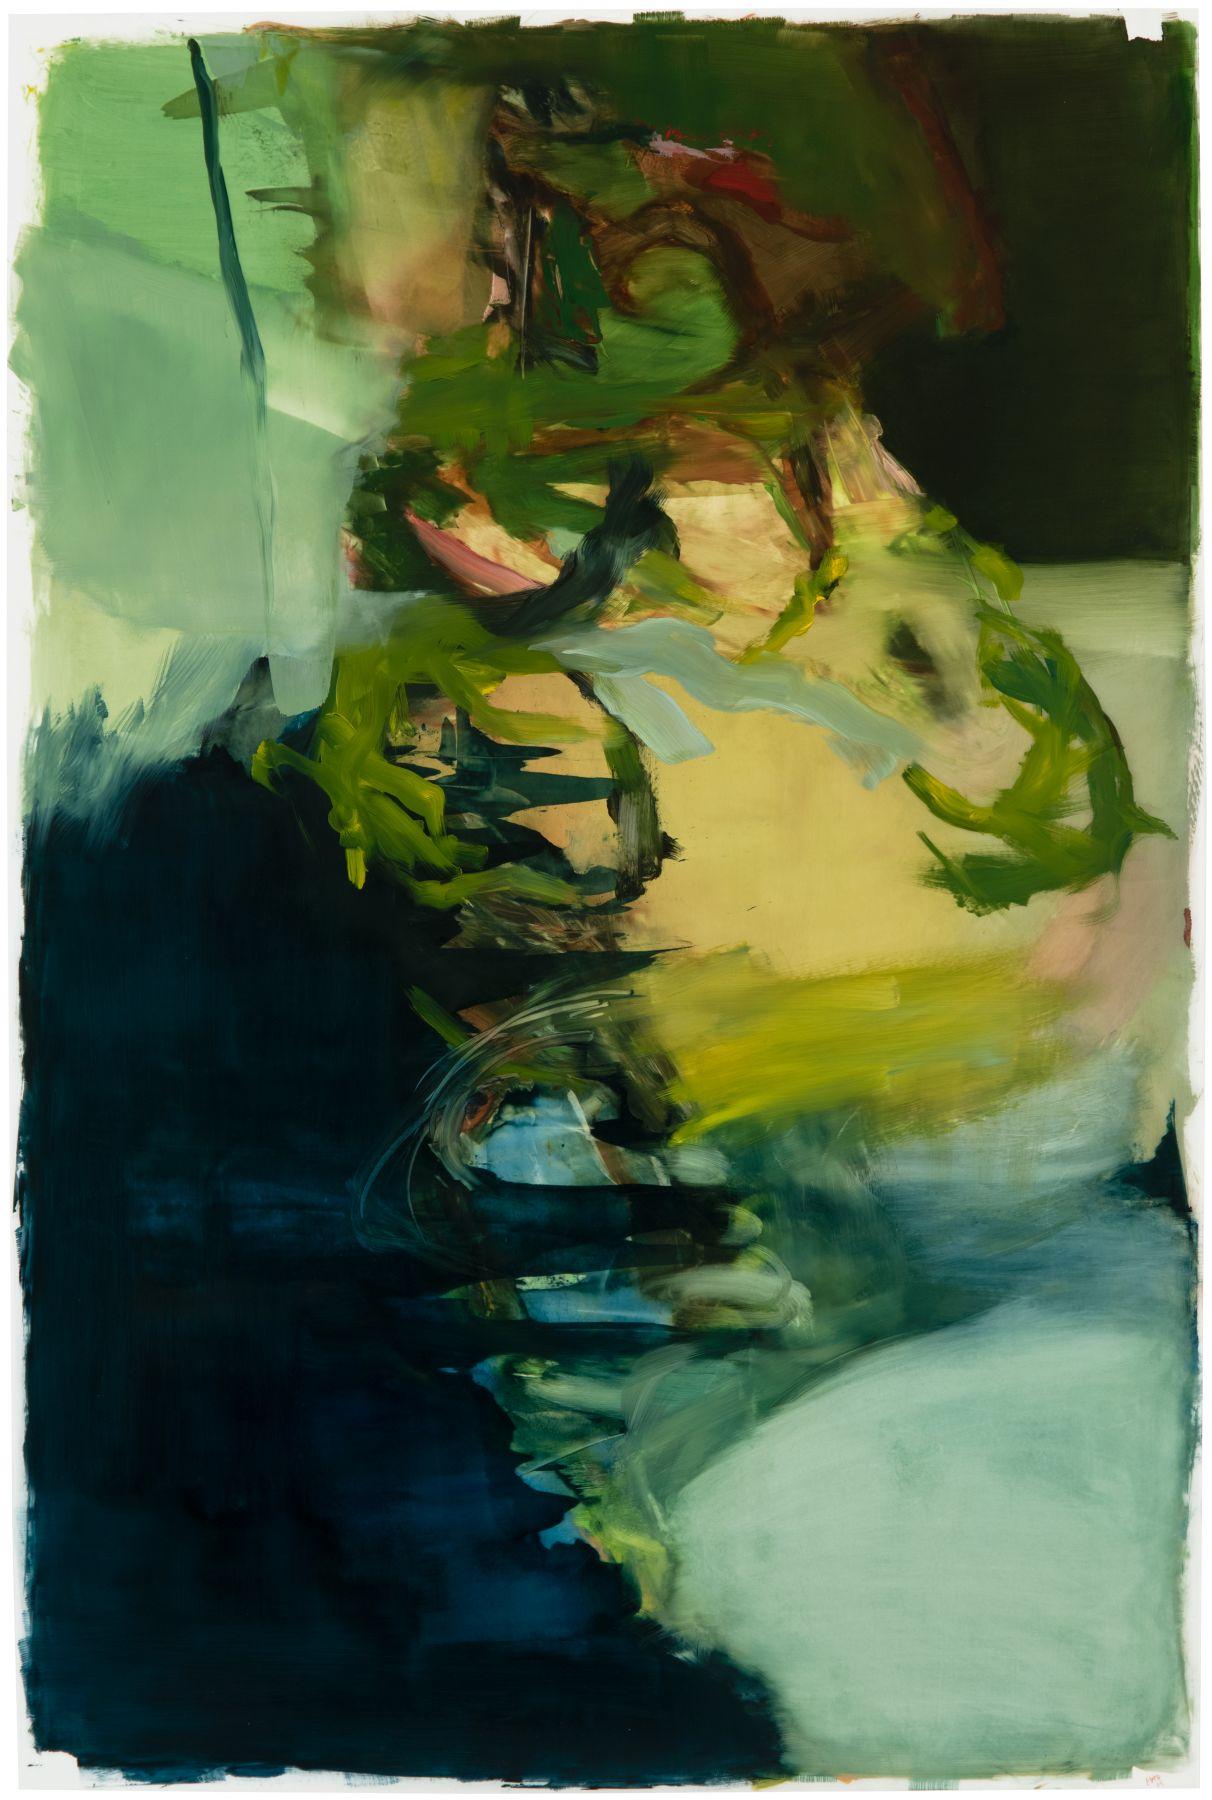 Hollis Heichemer (b. 1963) #1, 2019